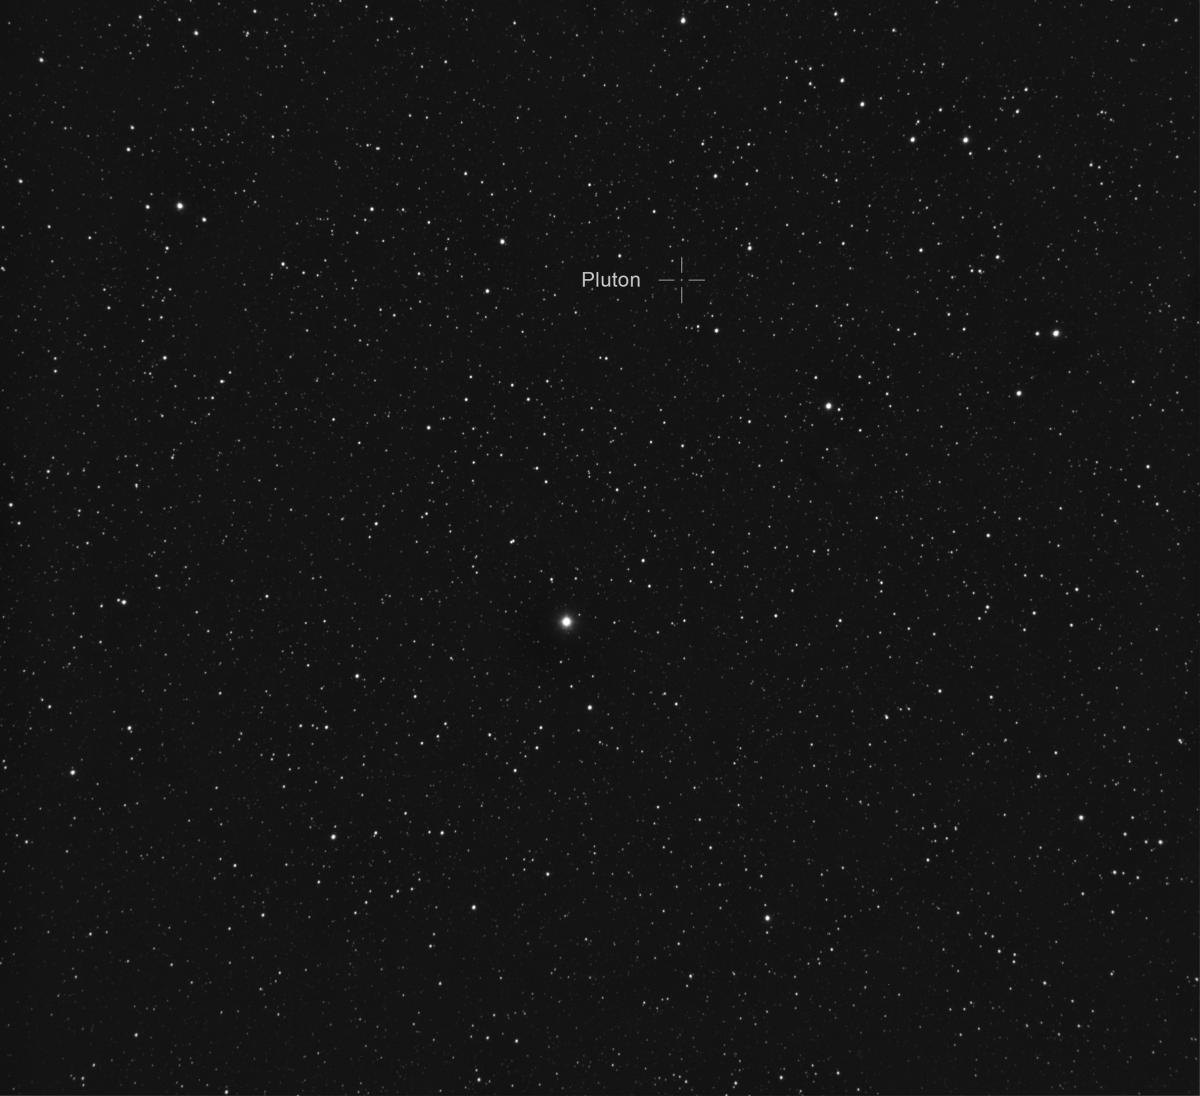 Pluton comp 02 1200x1096 - PLUTO